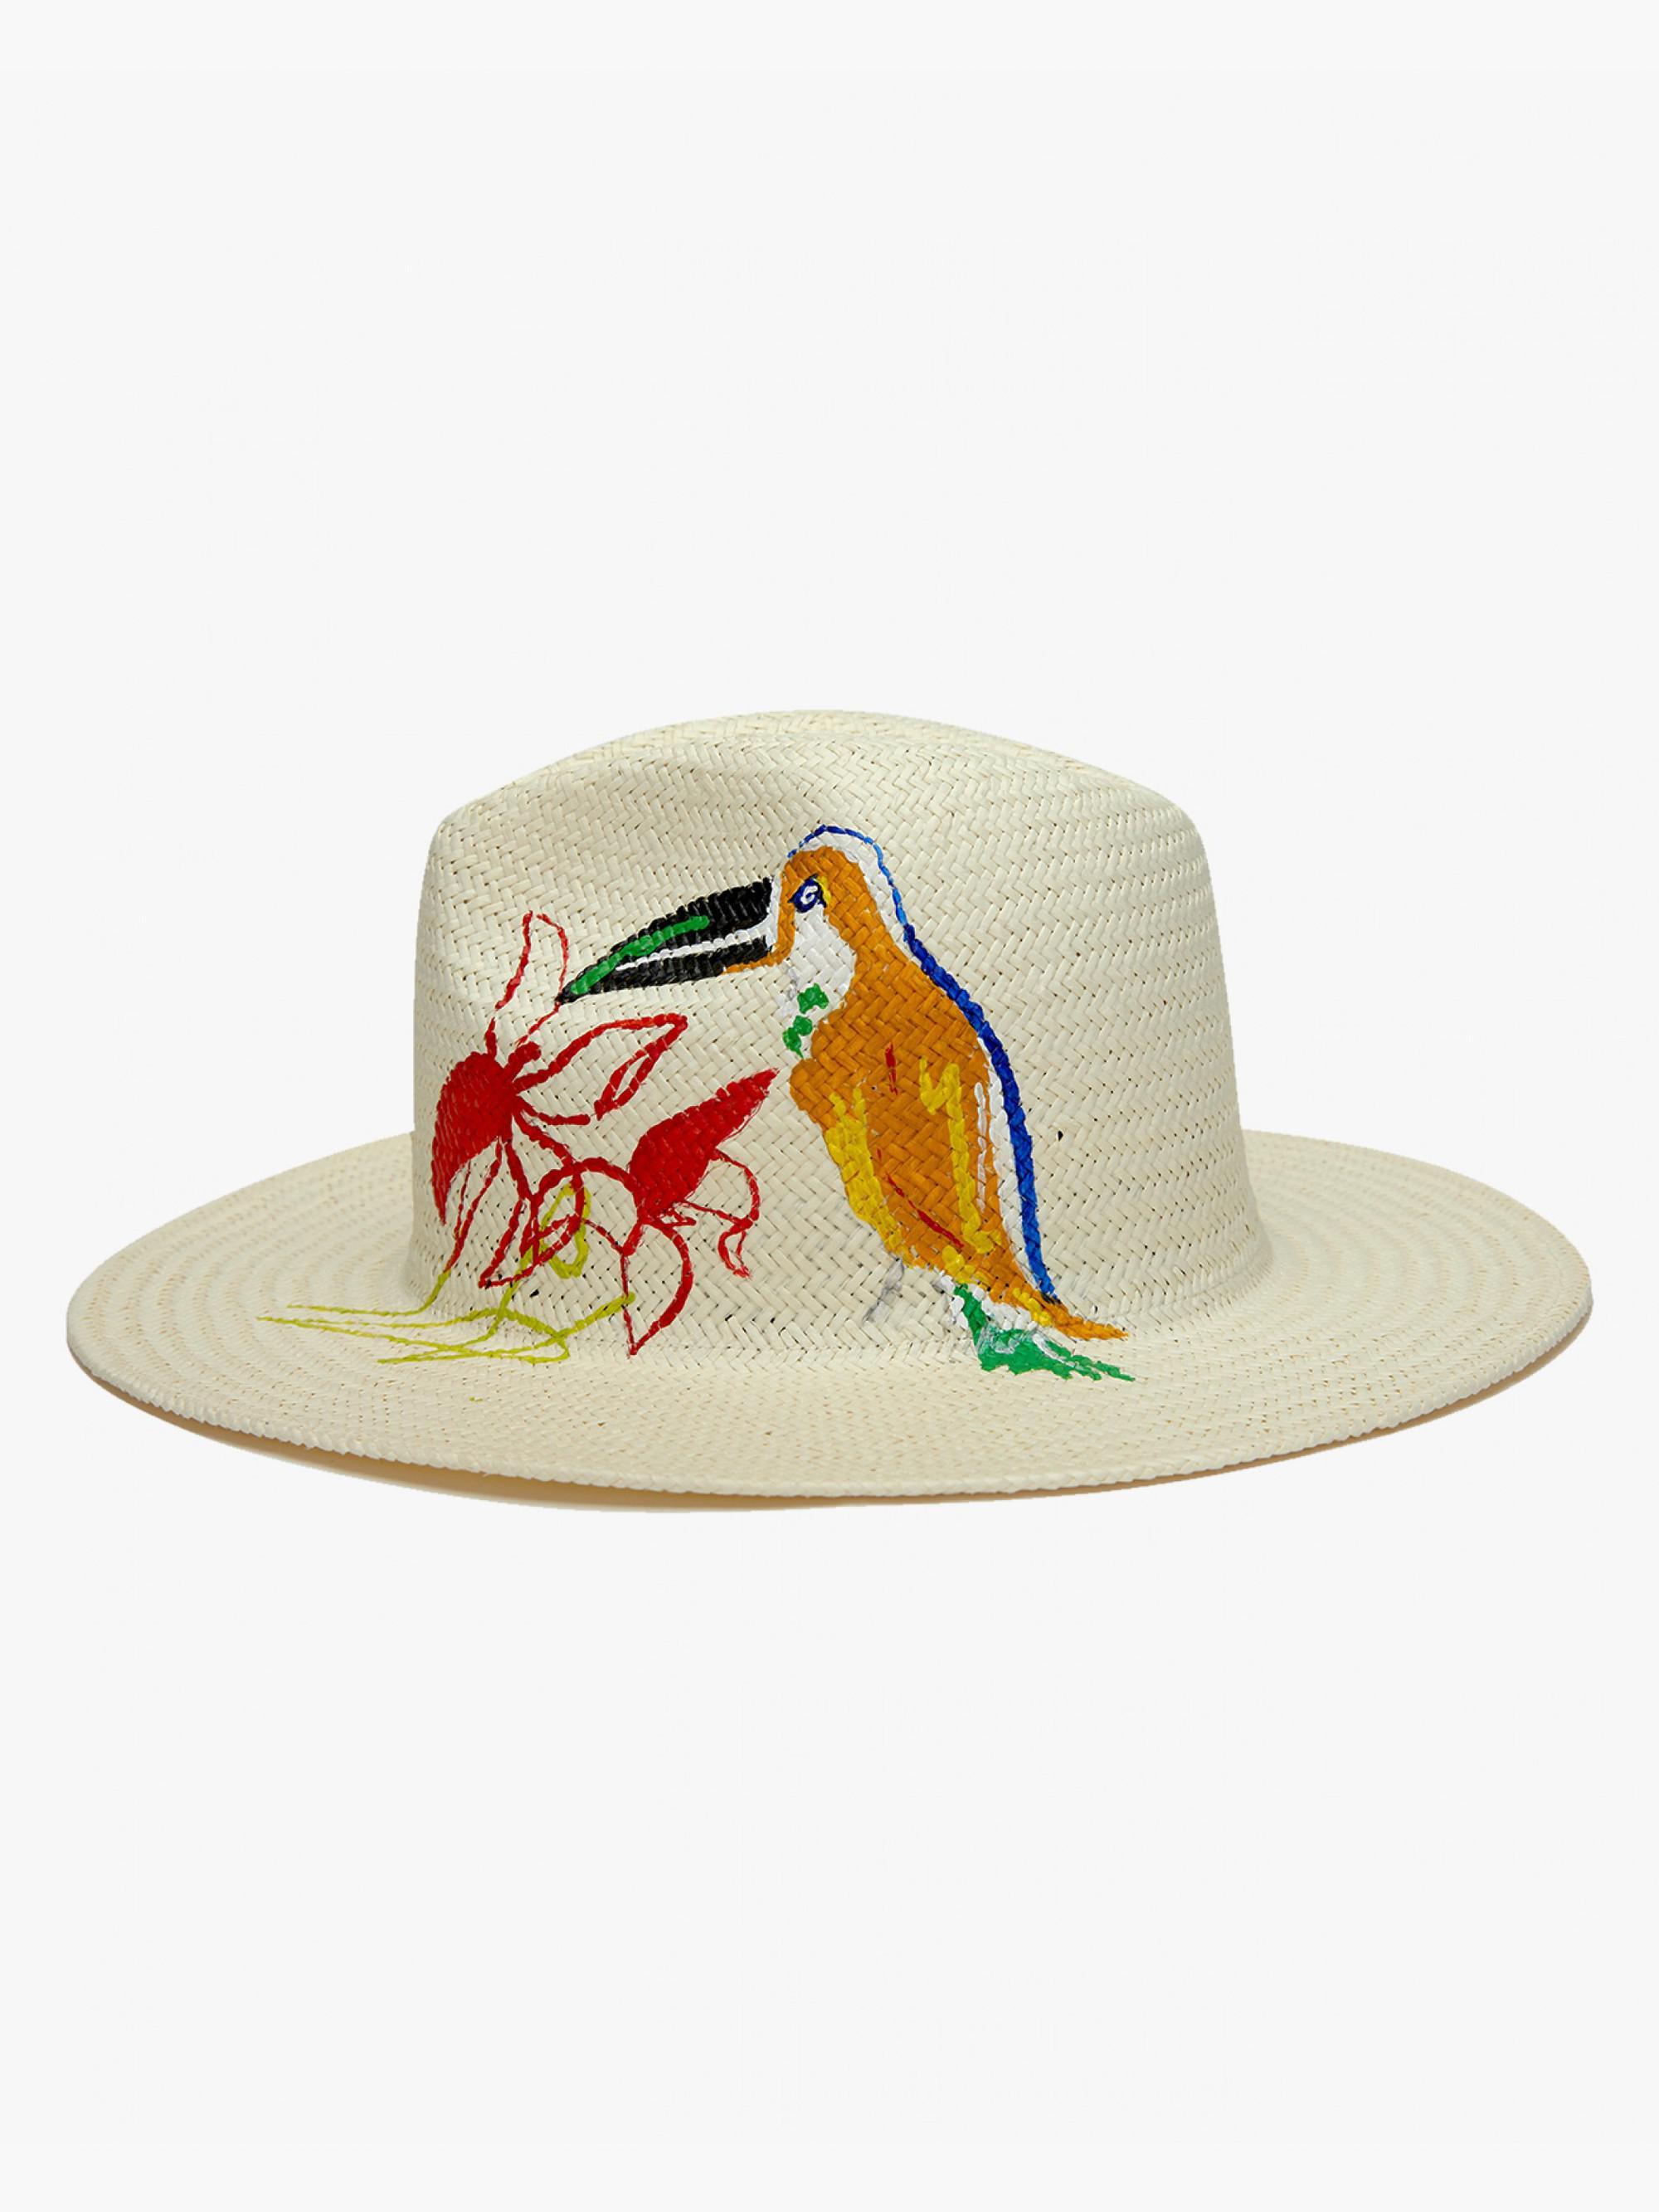 Lyst - Onia Rosa Panama Hat in White 4c729fe321ed